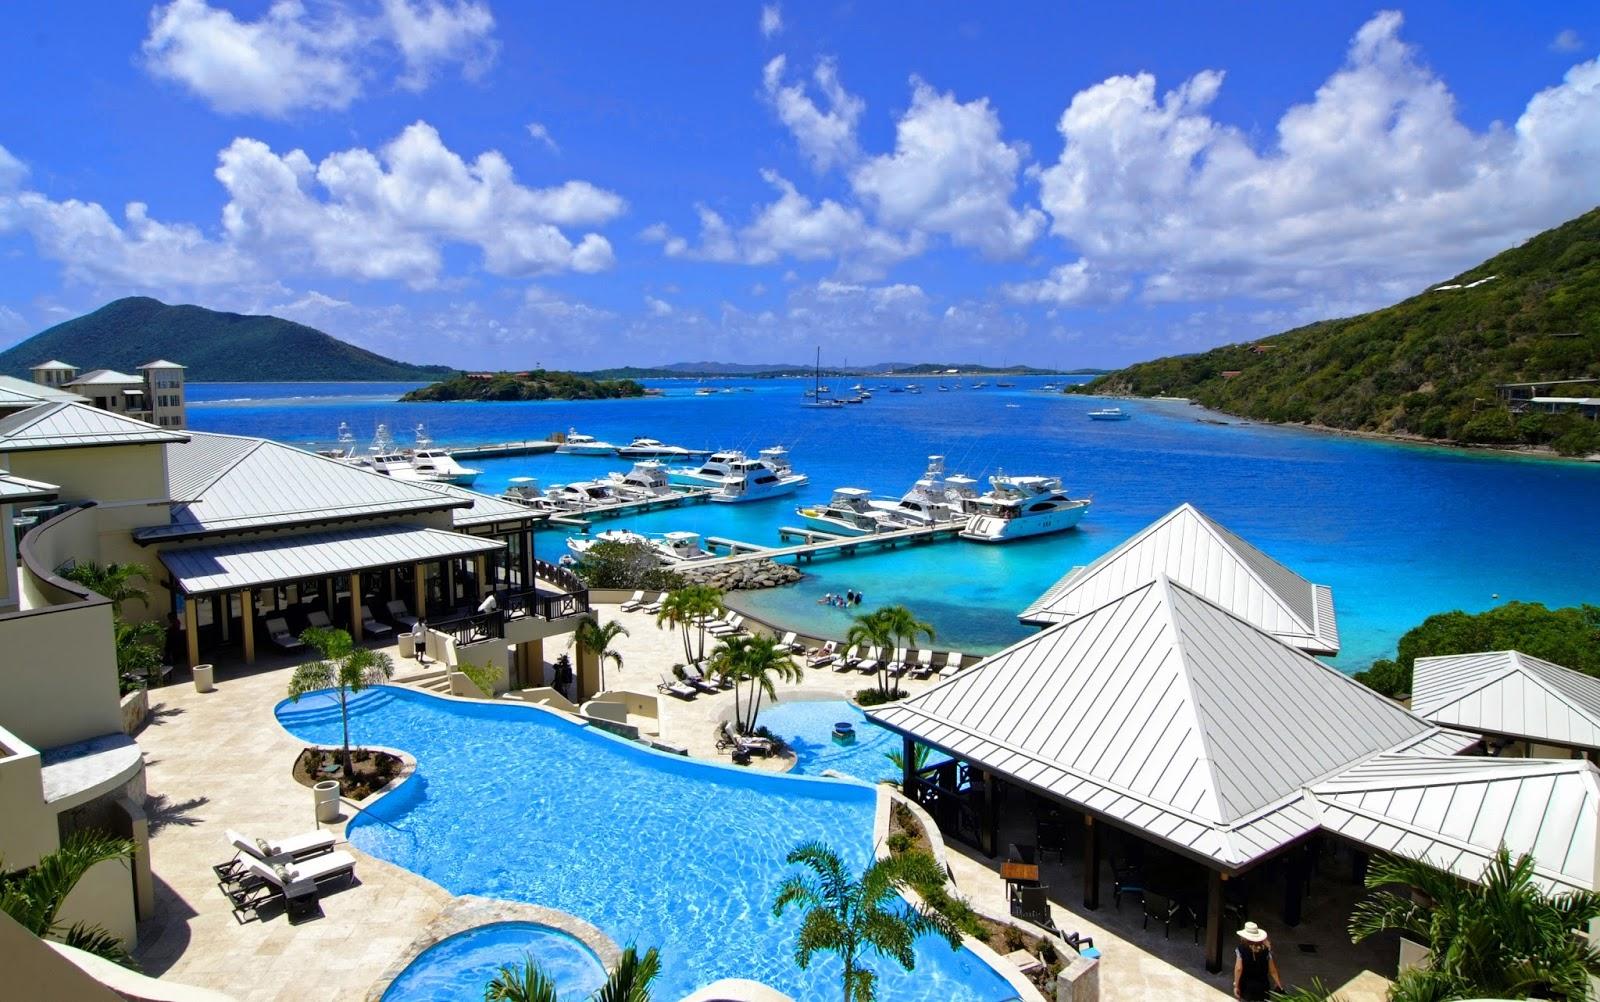 Download this Caribbean British Virgin Islands Scrub Island Resort picture